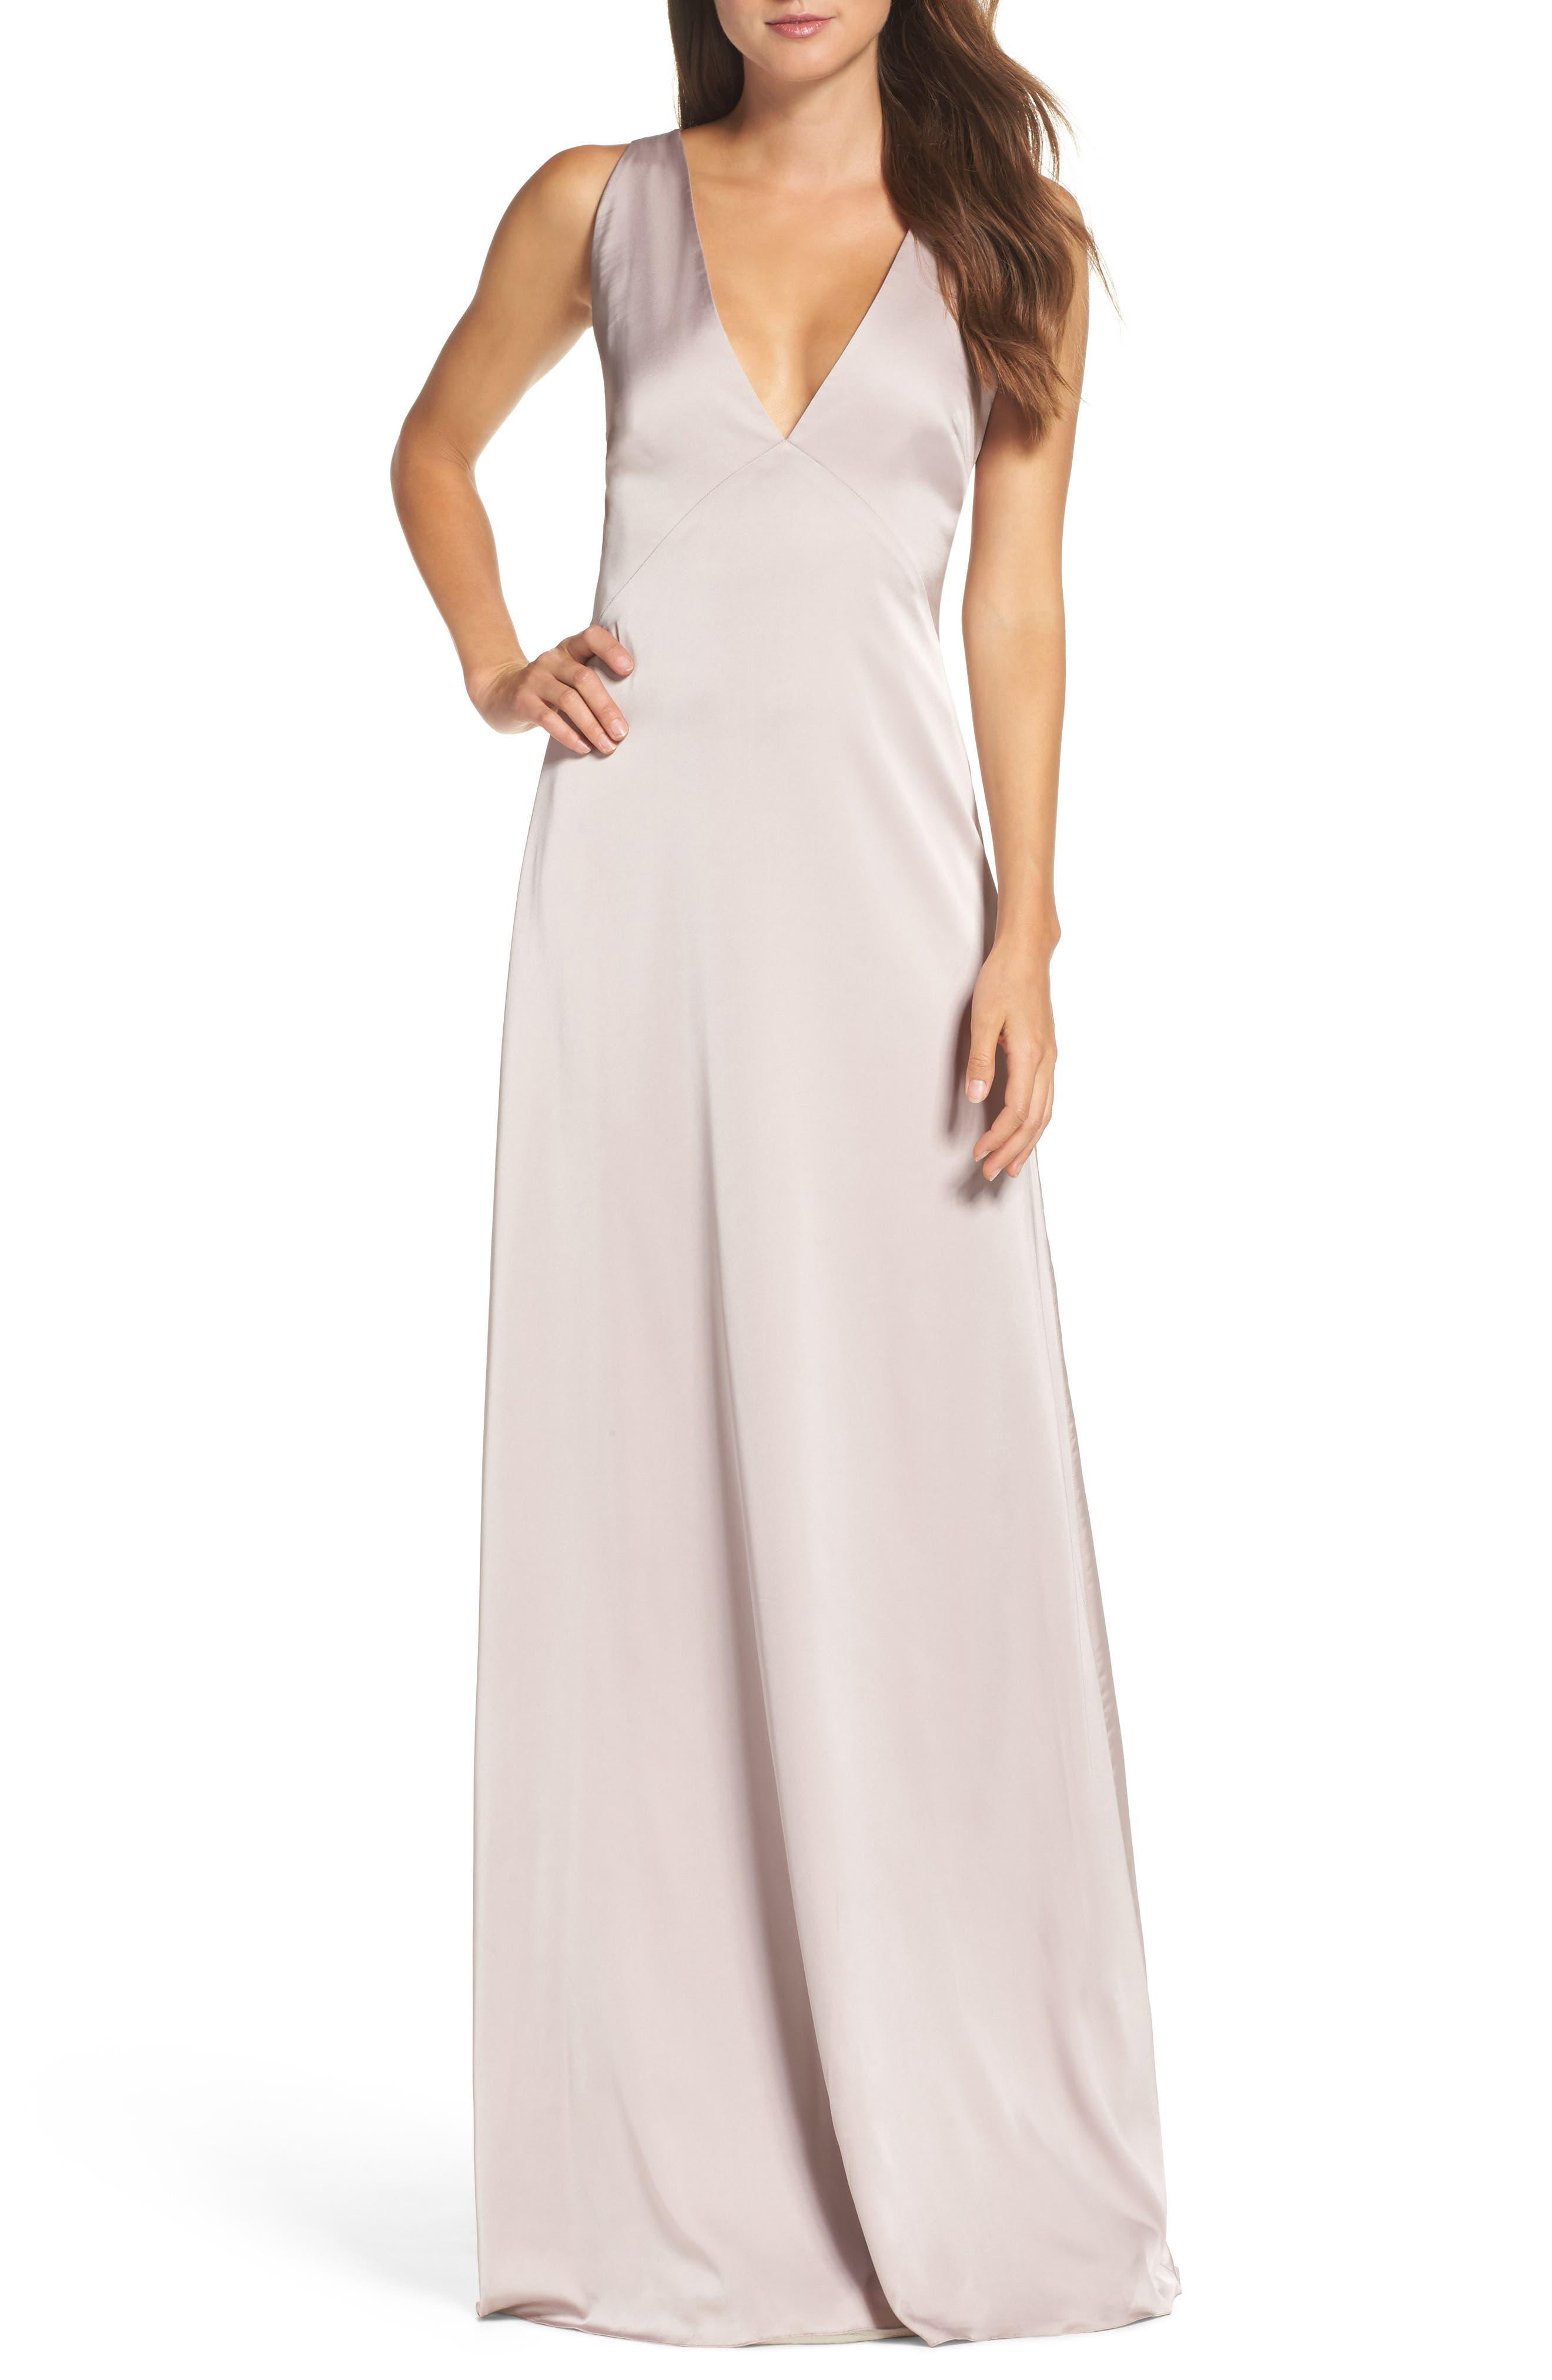 Alternate Image 1 Selected - Monique Lhuillier Bridesmaids Dasha Tie Back Sateen Gown